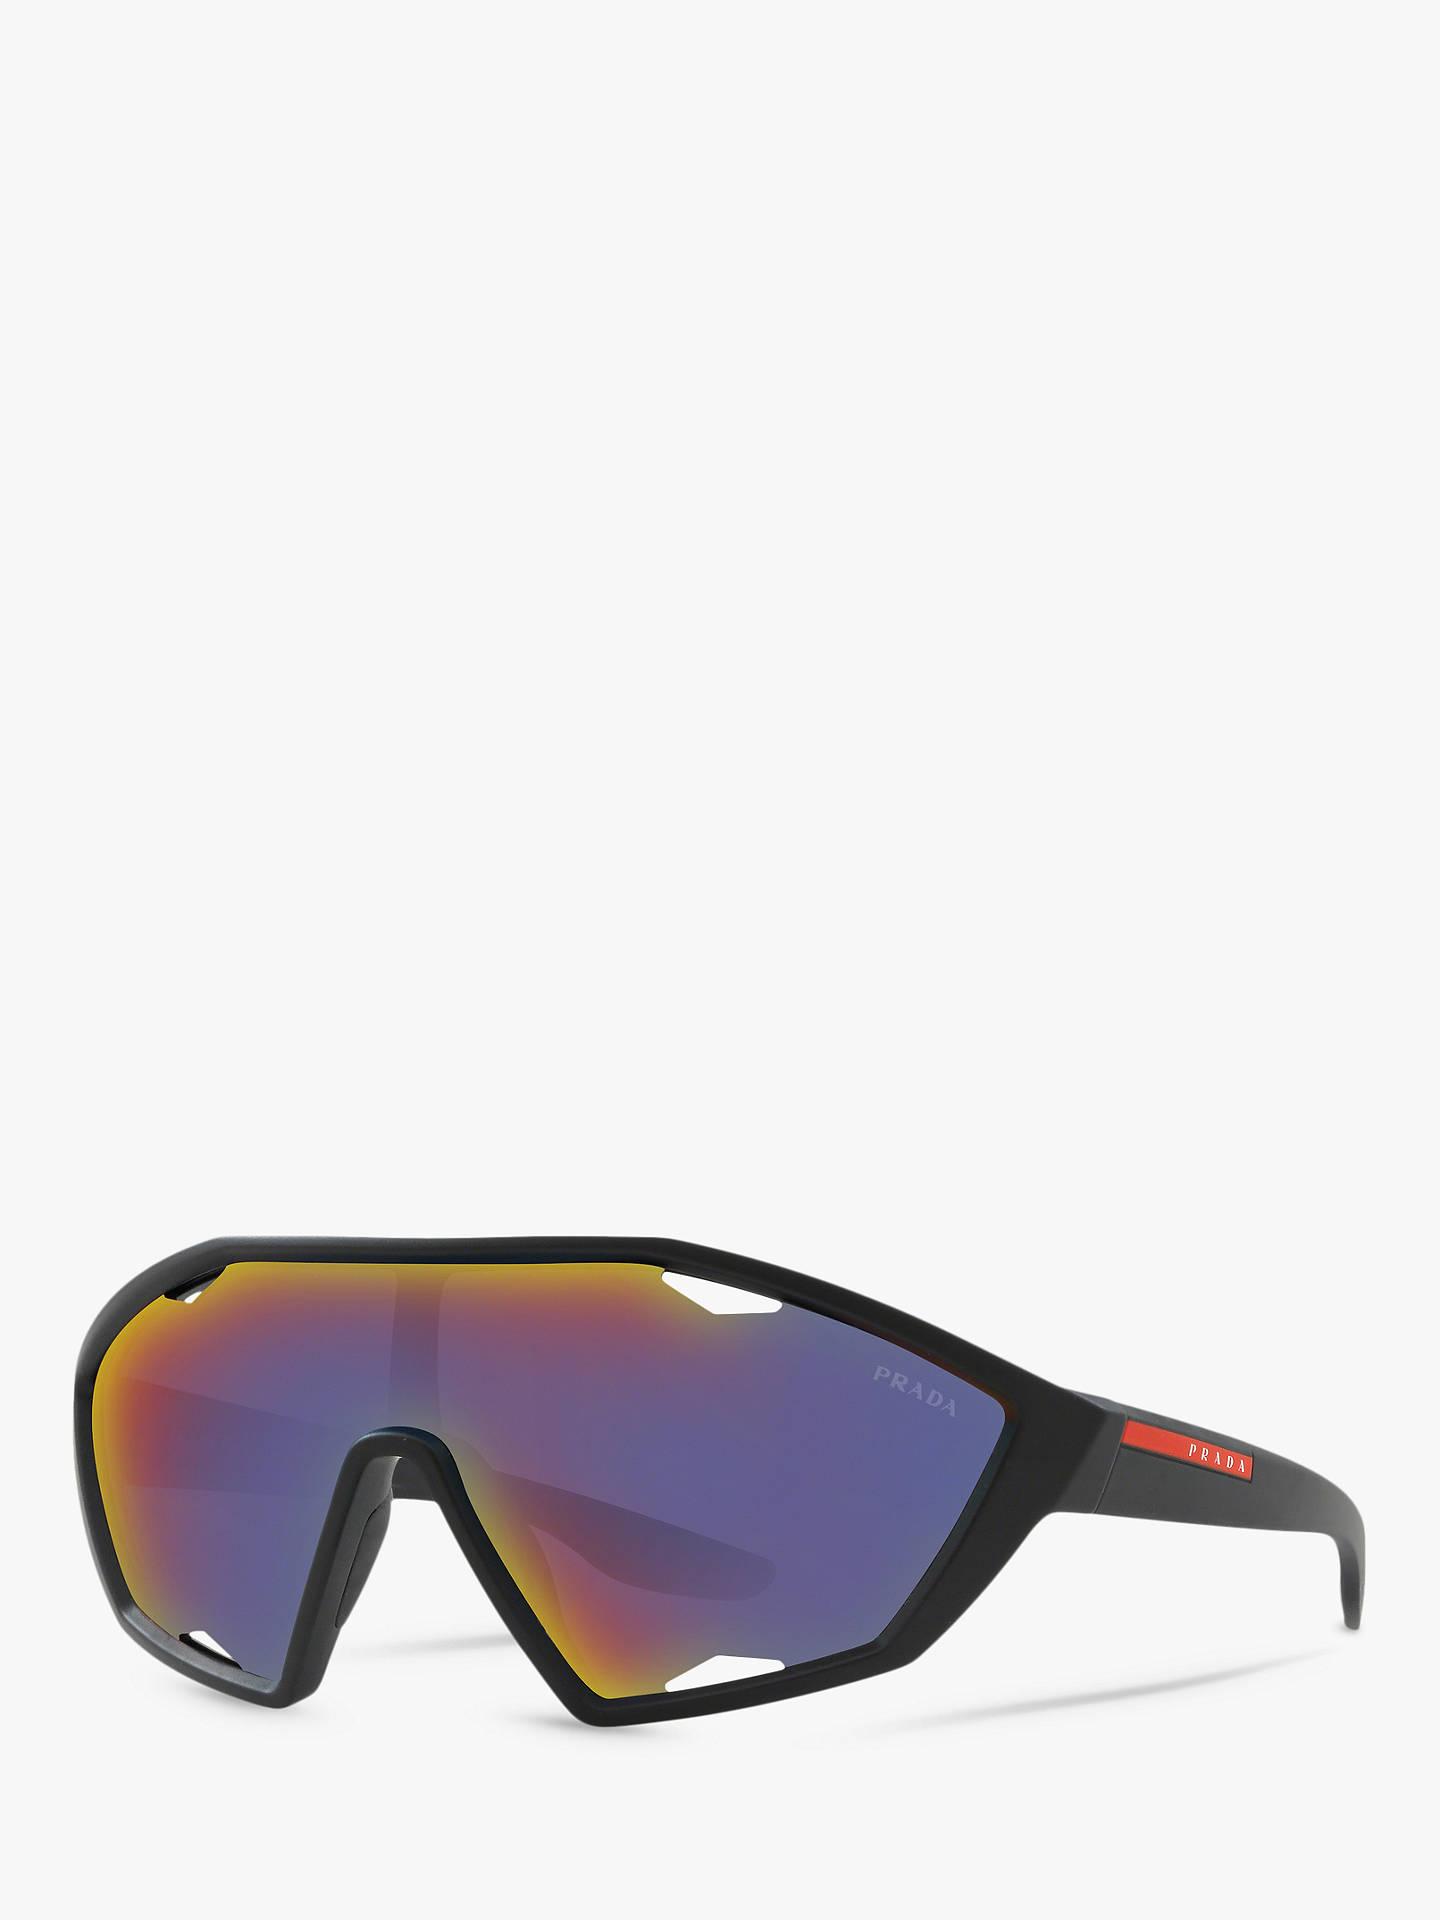 37e1edbcc3c7 Buy Prada PS 10US Men s Wrap Sunglasses